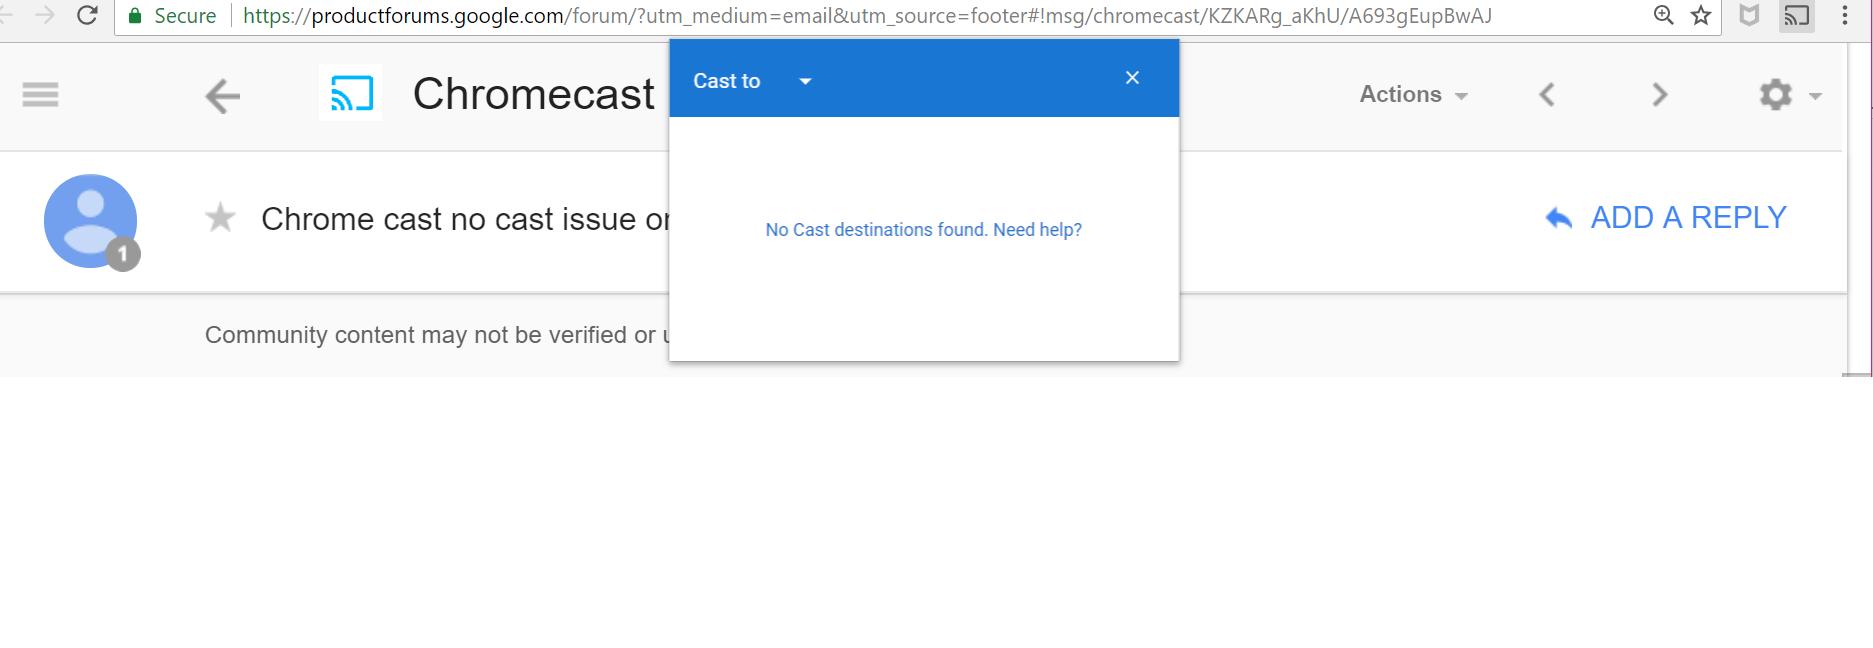 Chromecast Not Working With Ubiquiti